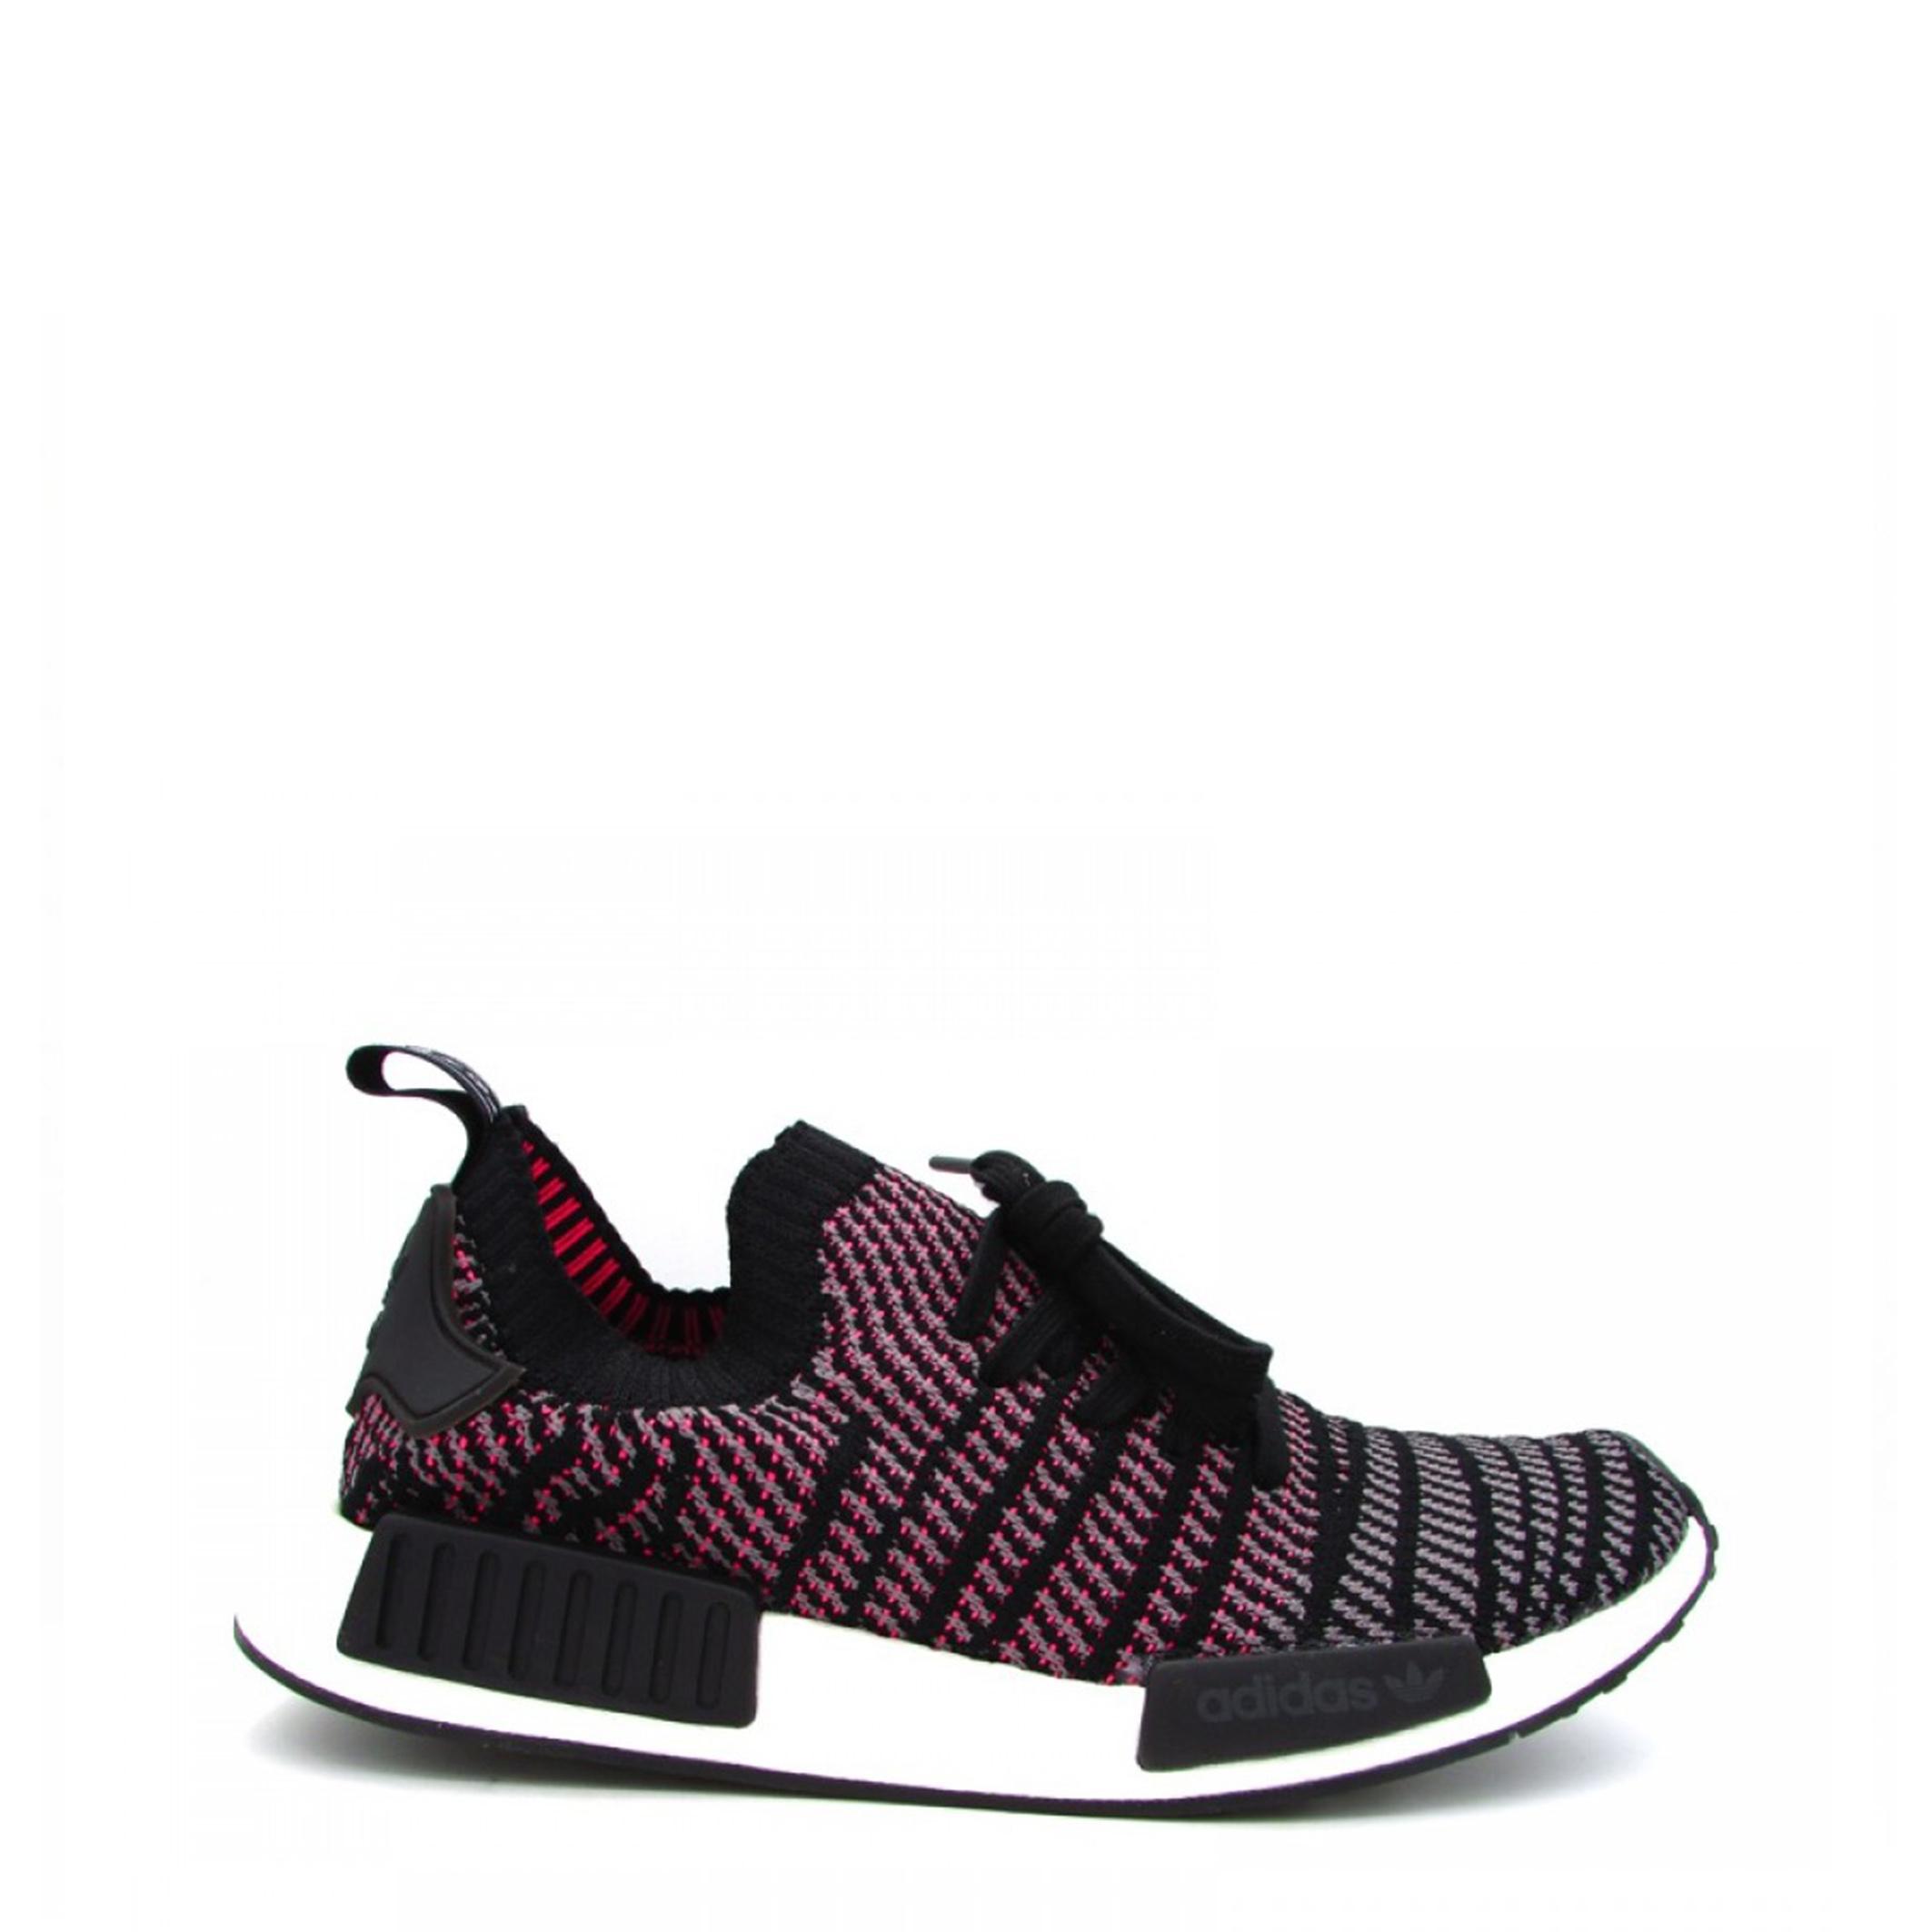 Adidas NMD R1 STLT